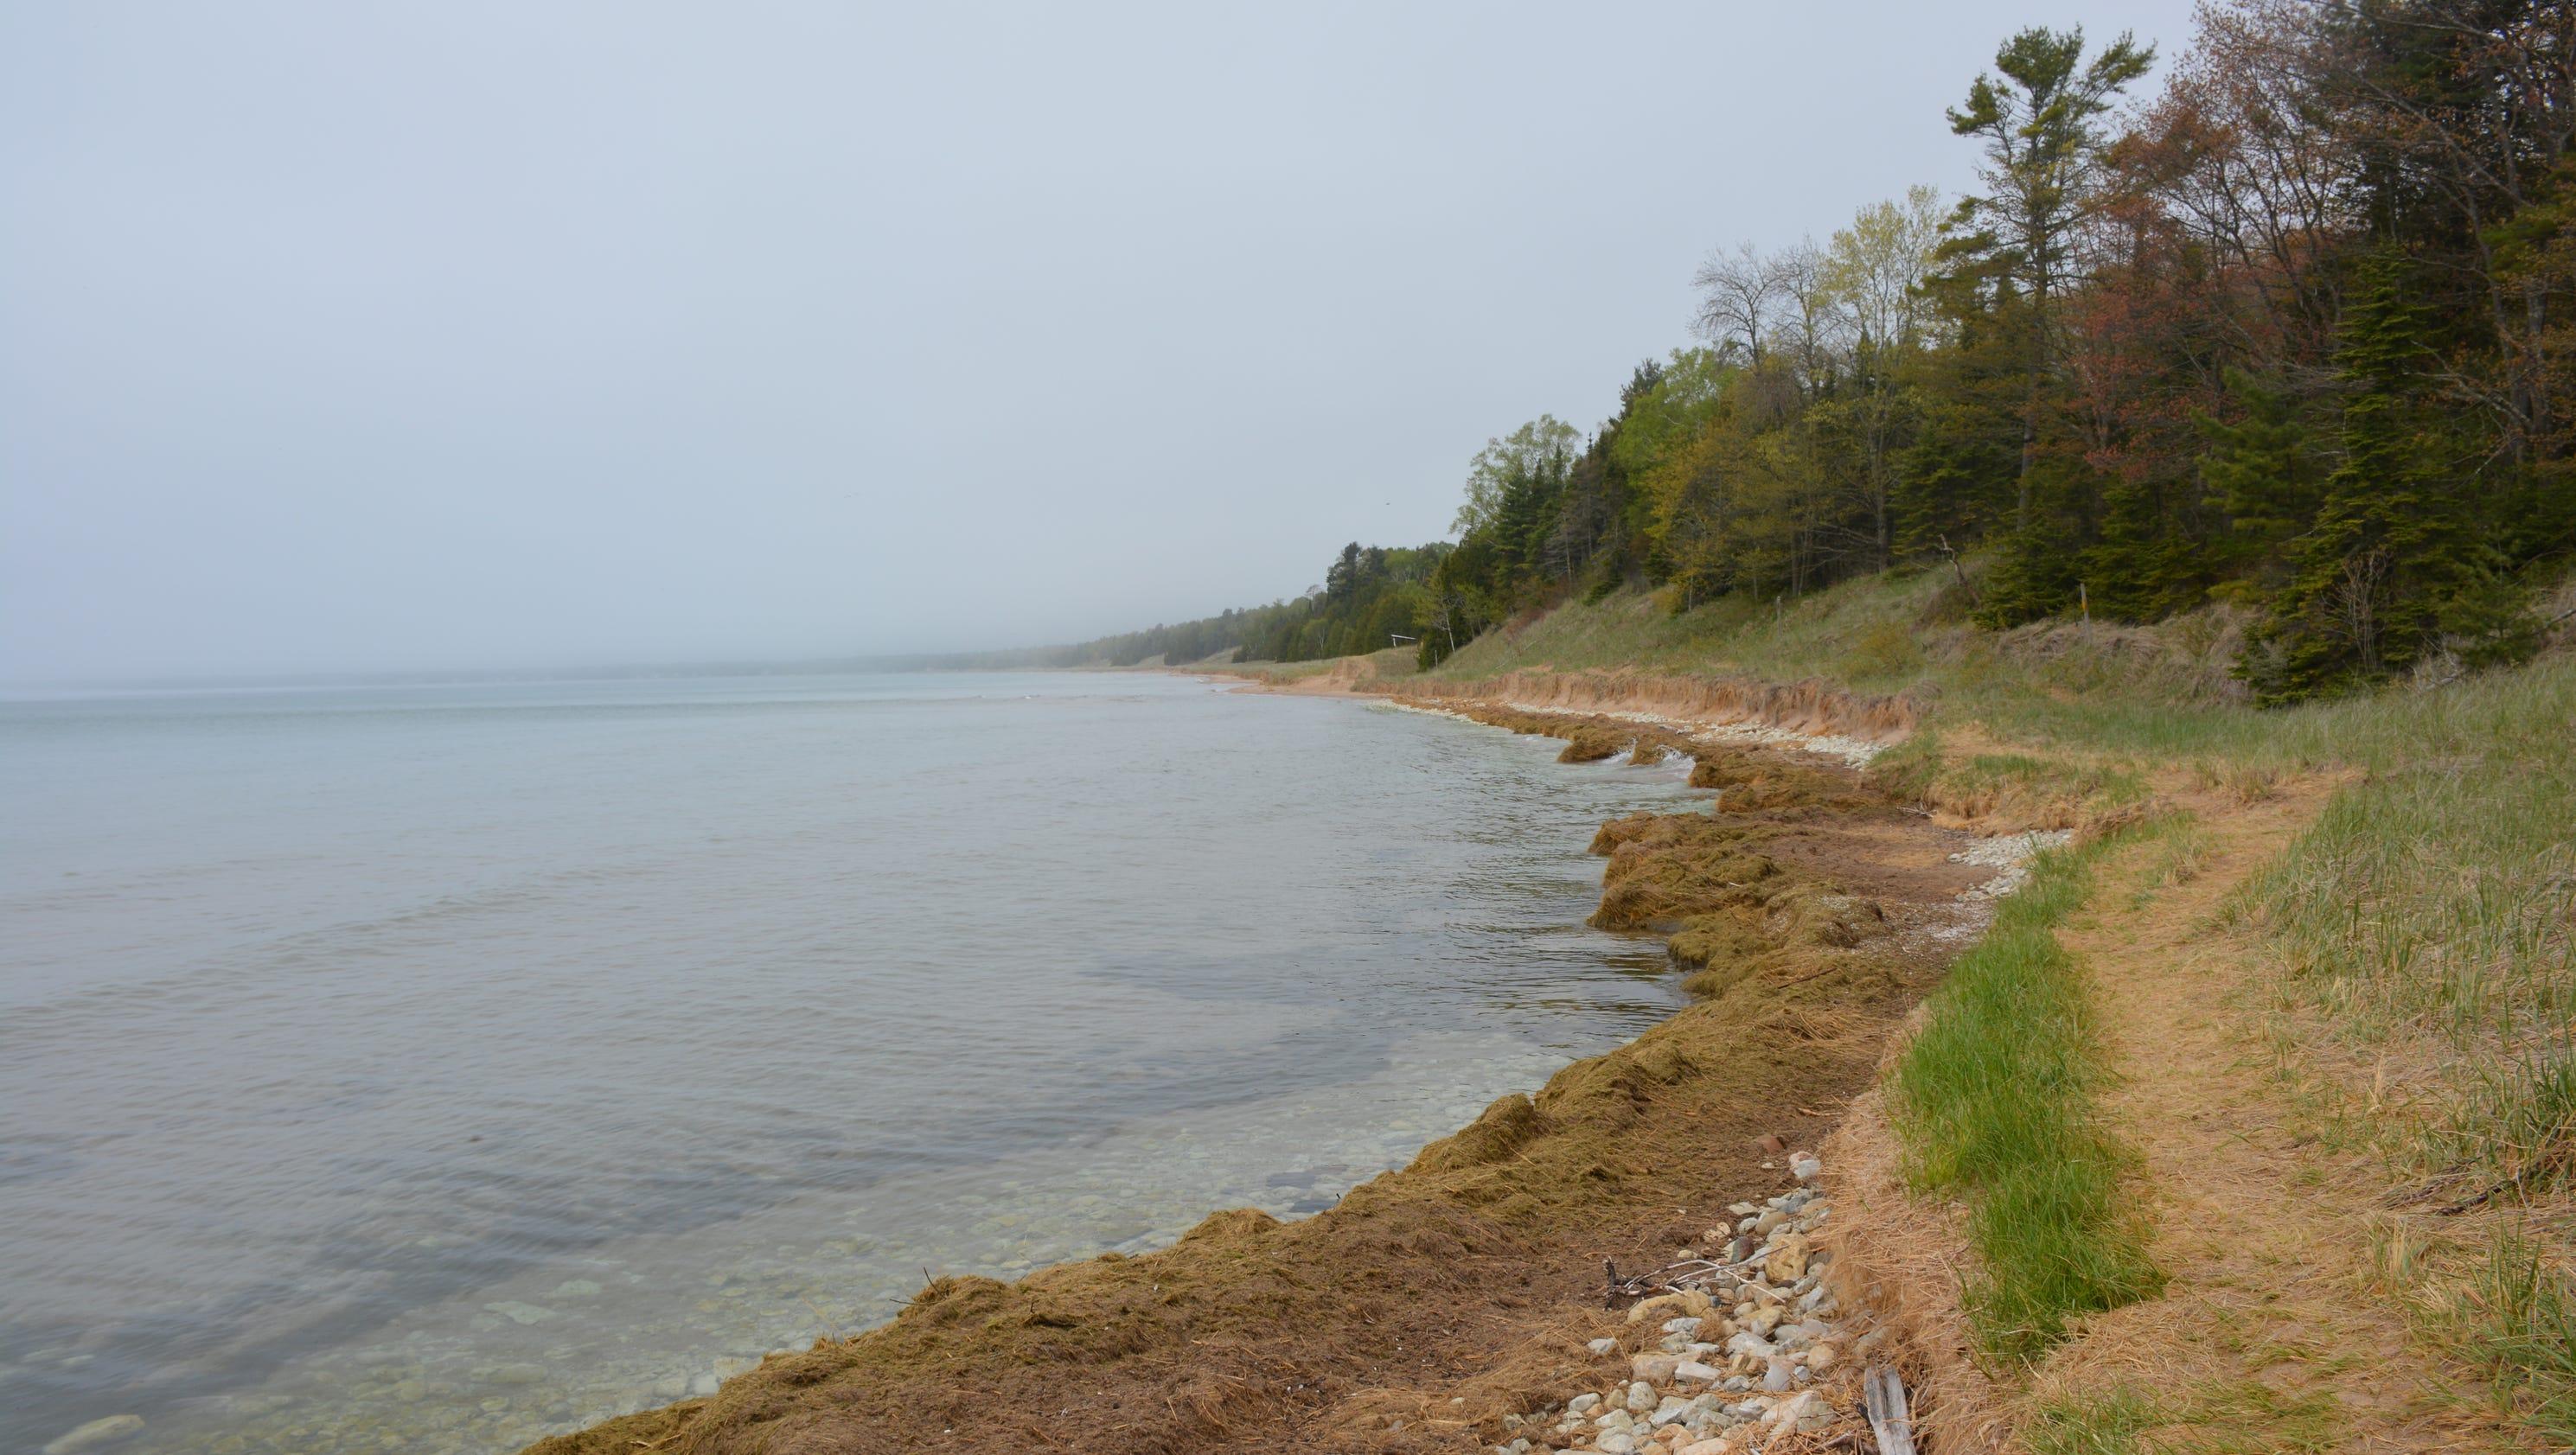 Lake Michigan Water Levels See Historic Rise